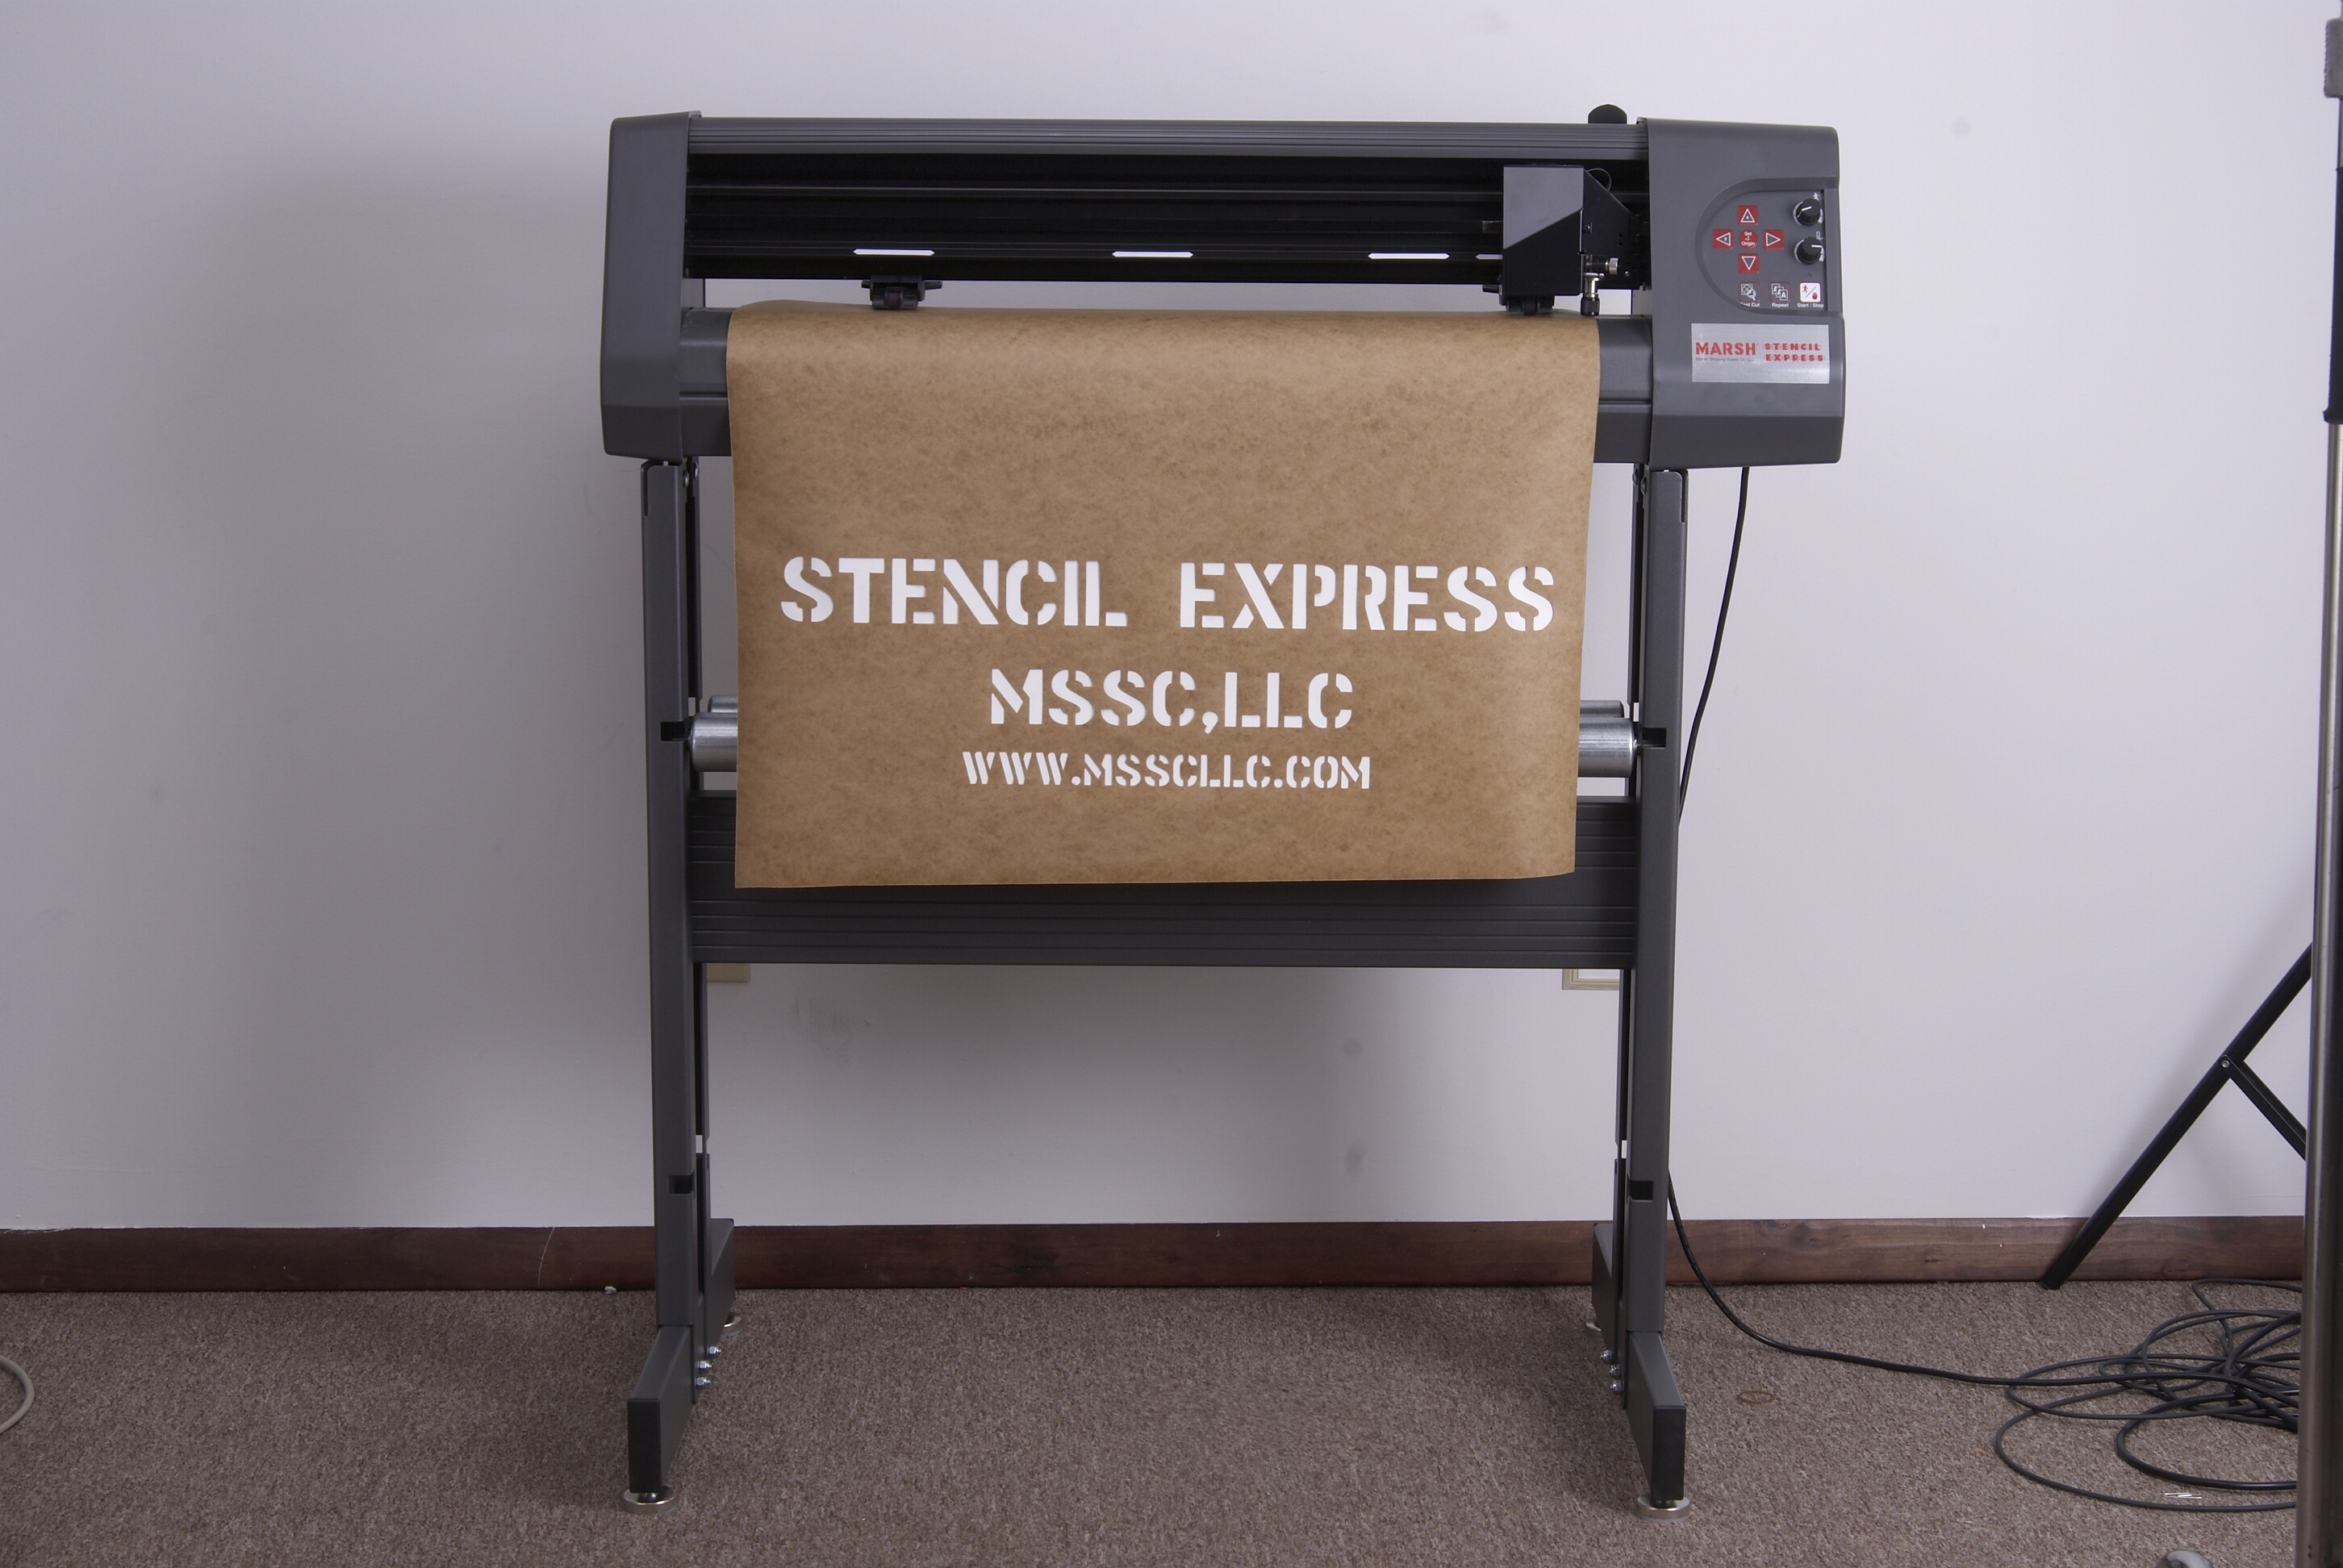 Stencil Equipment and Supplies